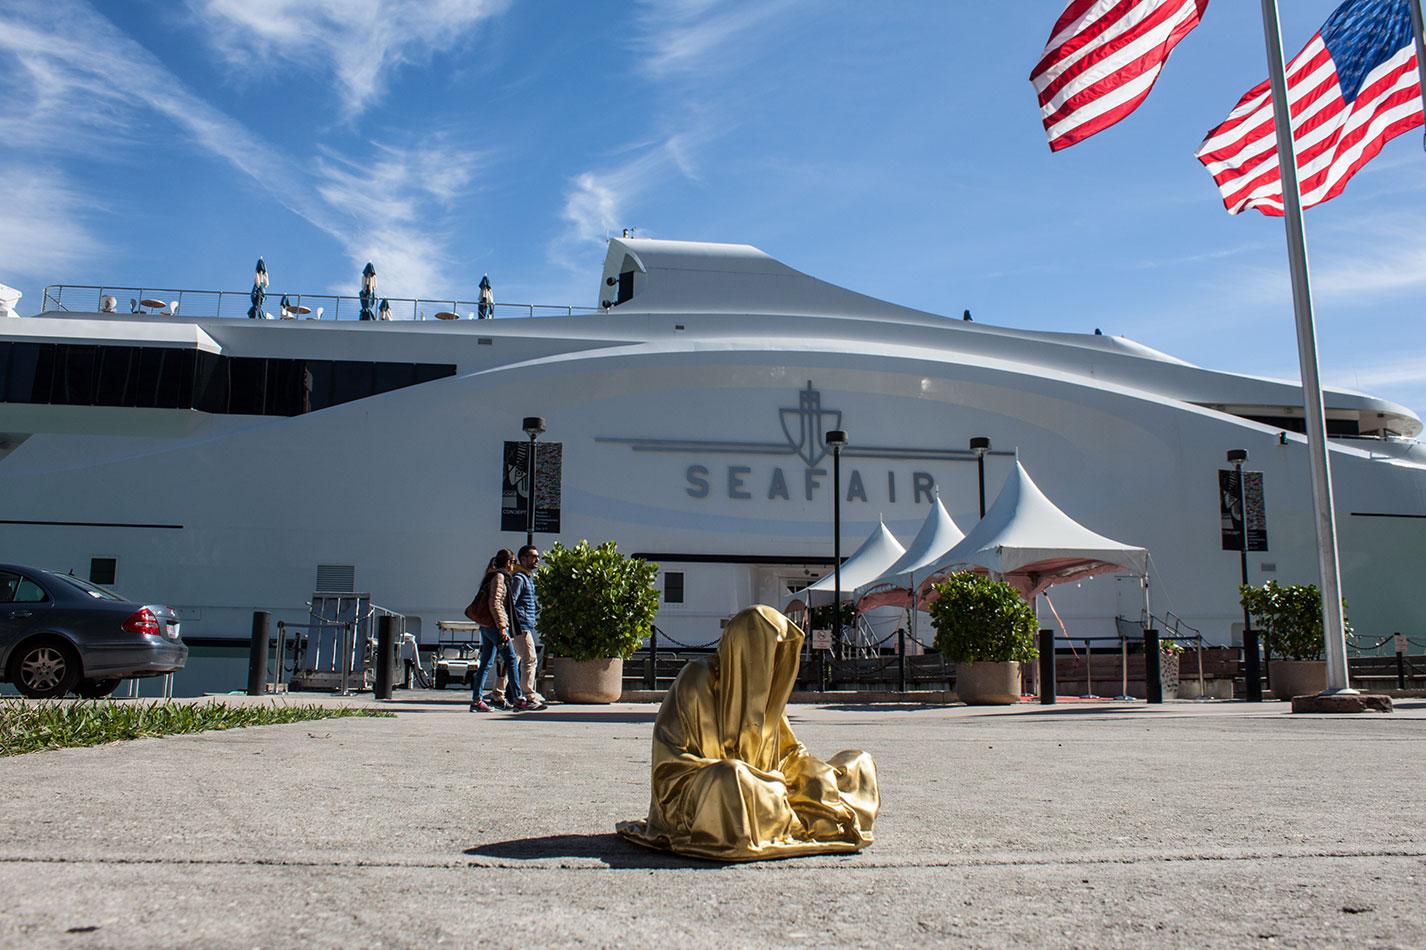 seafair-public-art-basel-miami-beach-fair-usa-florida-guardians-of-time-manfred-kili-kielnhofer-contemporary-fine-art-modern-arts-design-antiques-sculpture-6703